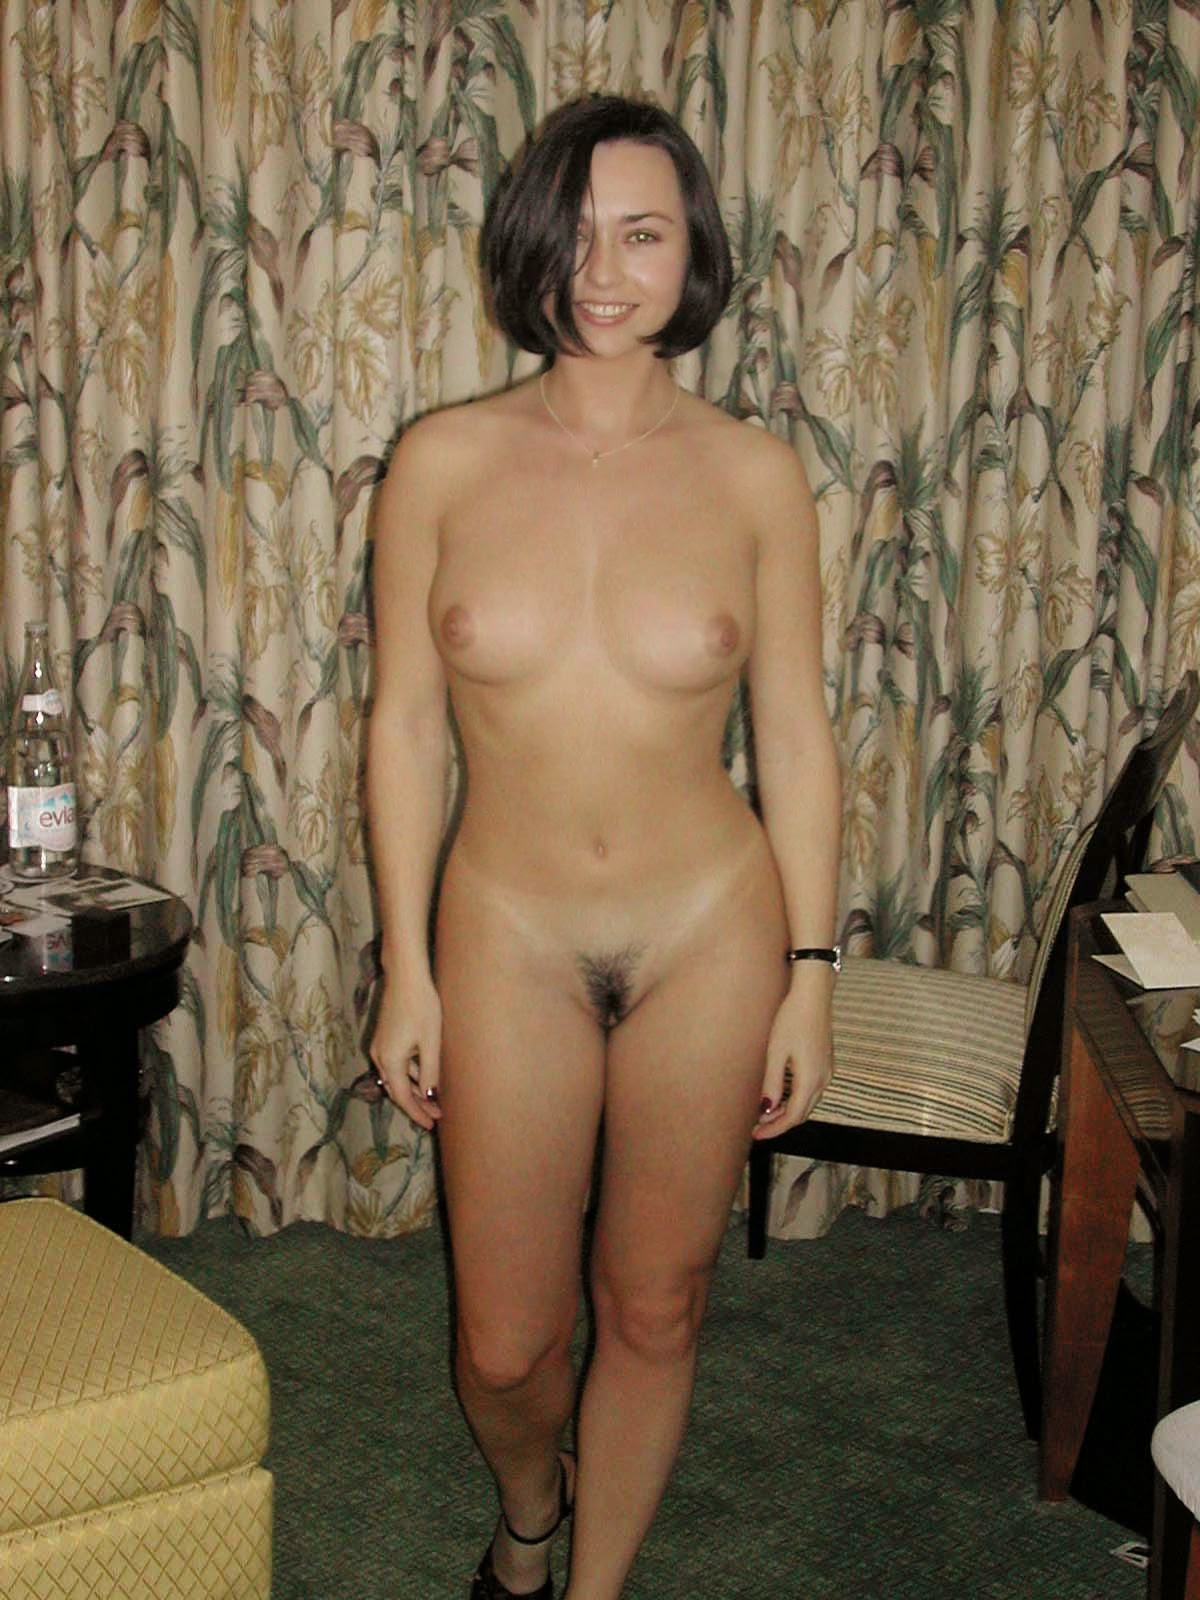 golie-muzhskie-fotografii